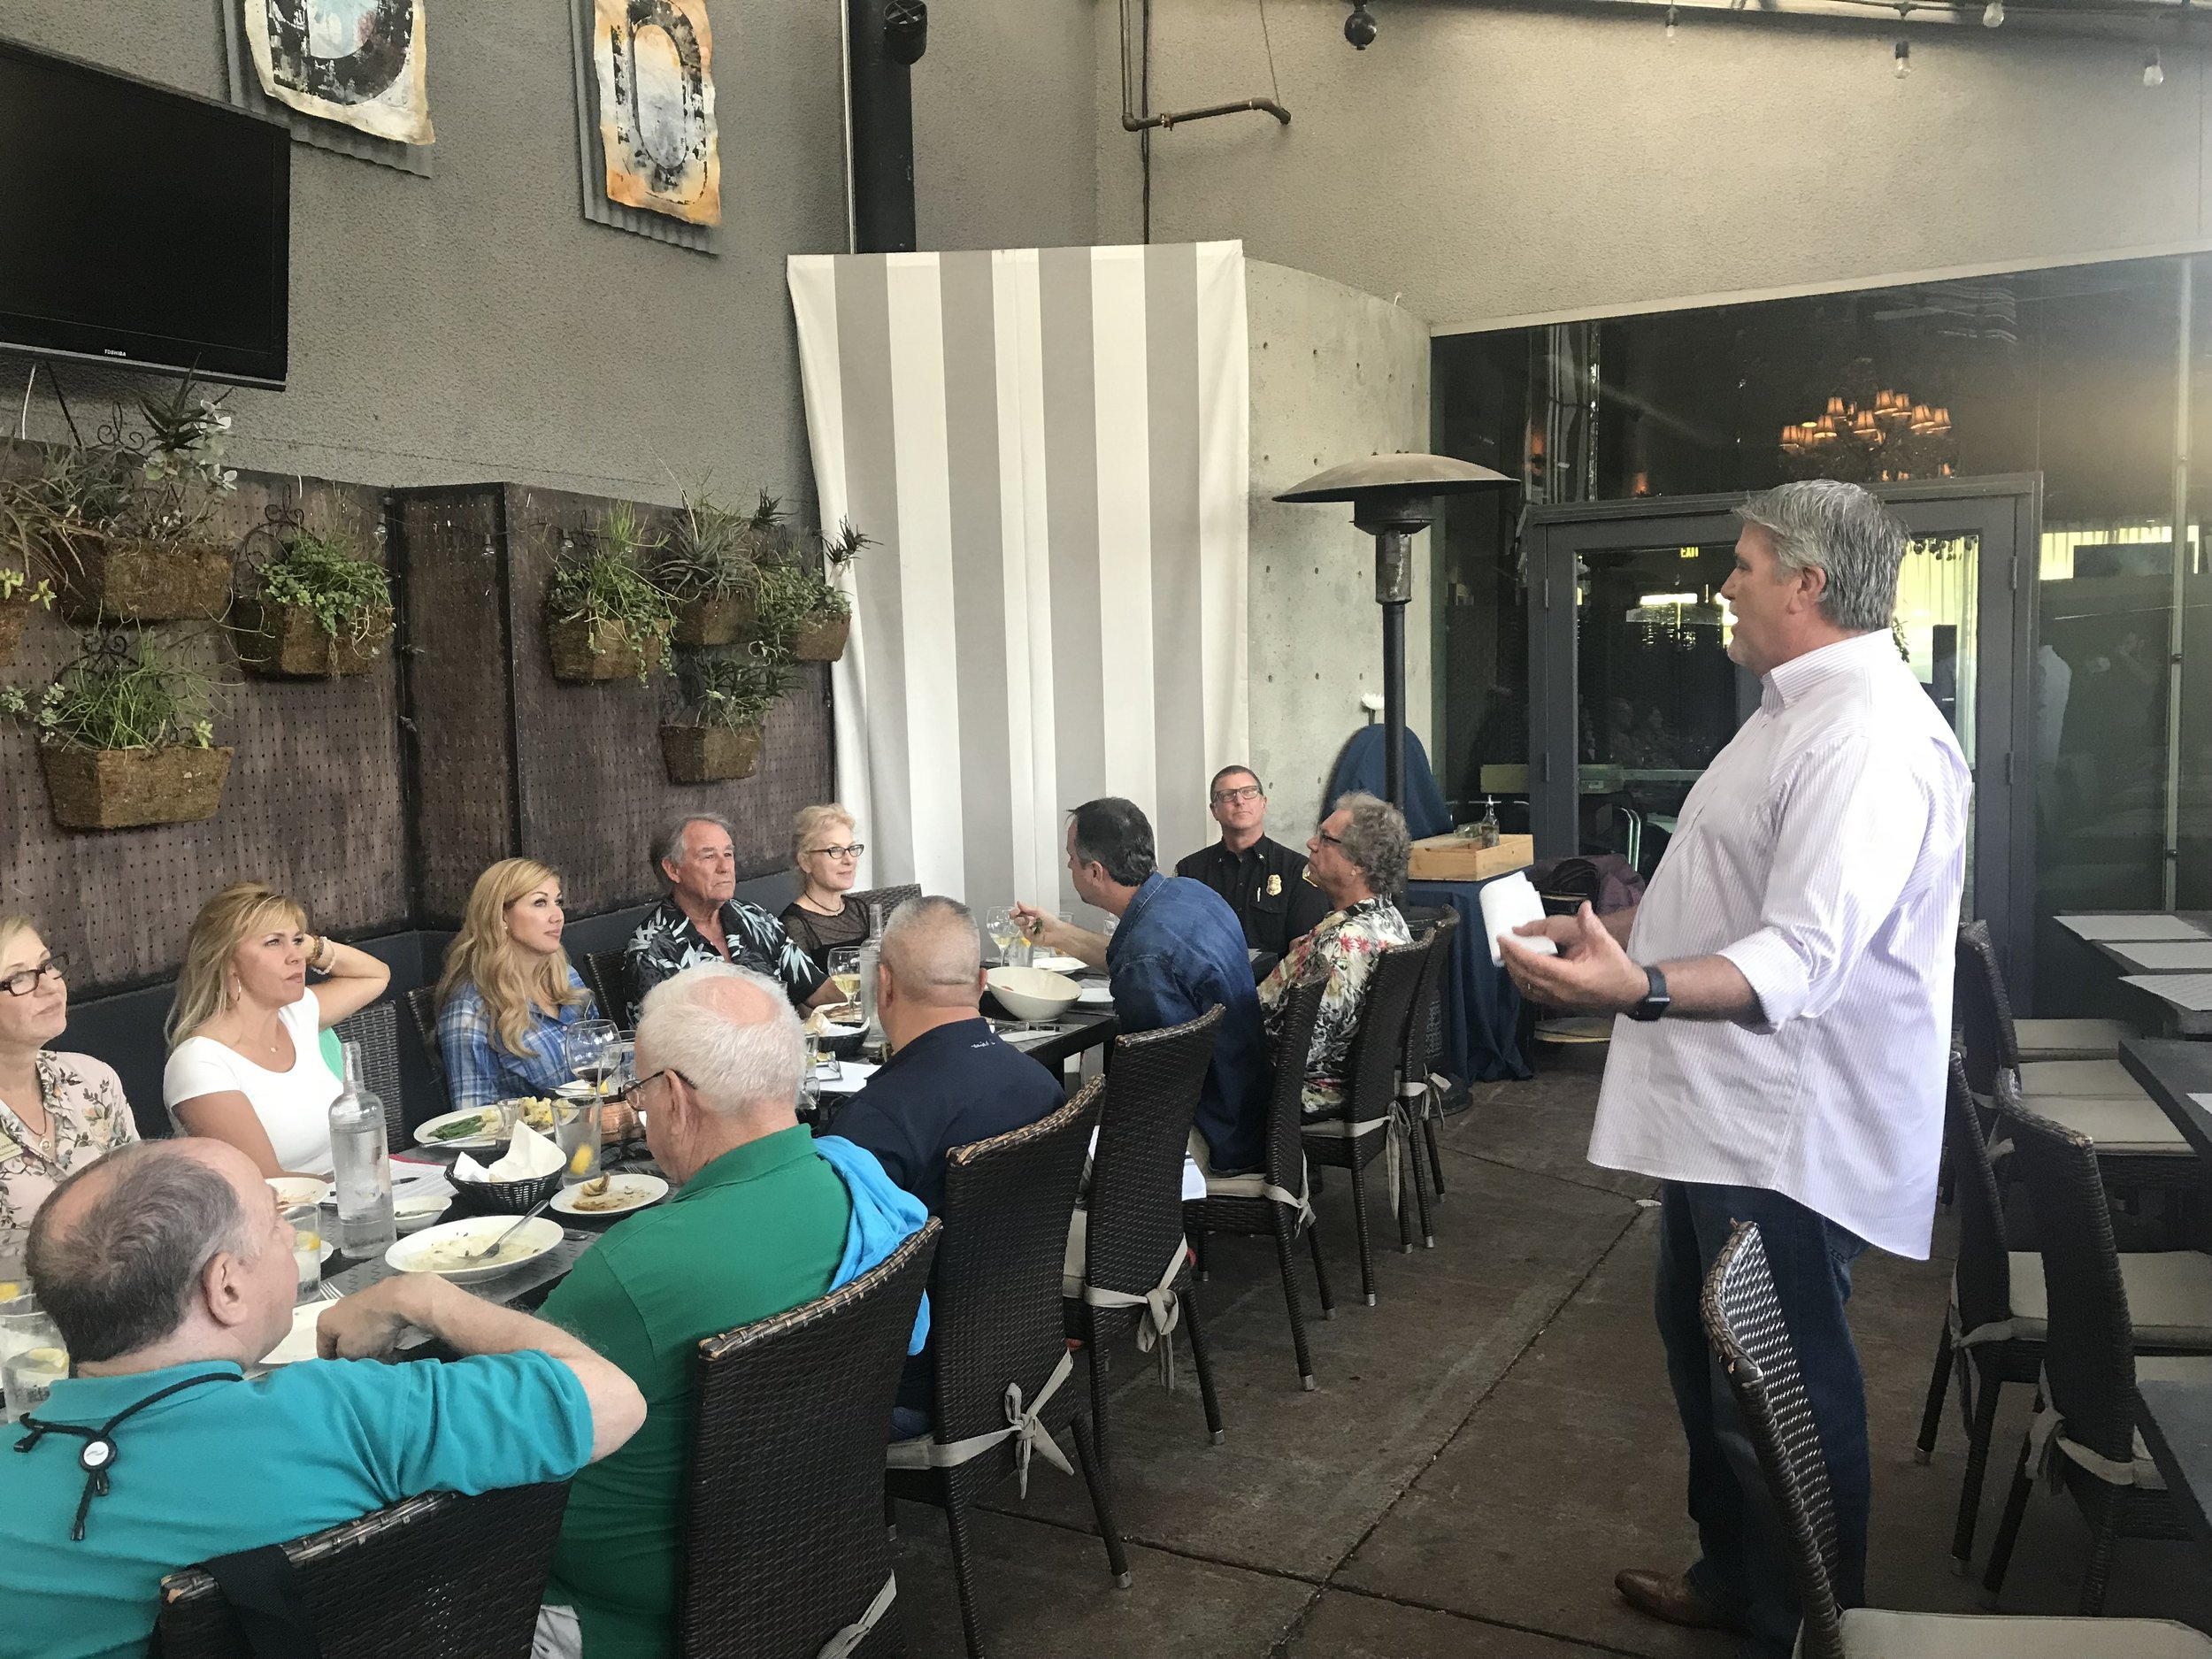 Former Manhattan Beach Fire Chief, Bob Espinoza, addresses the Kiwanis Club of Manhattan Beach